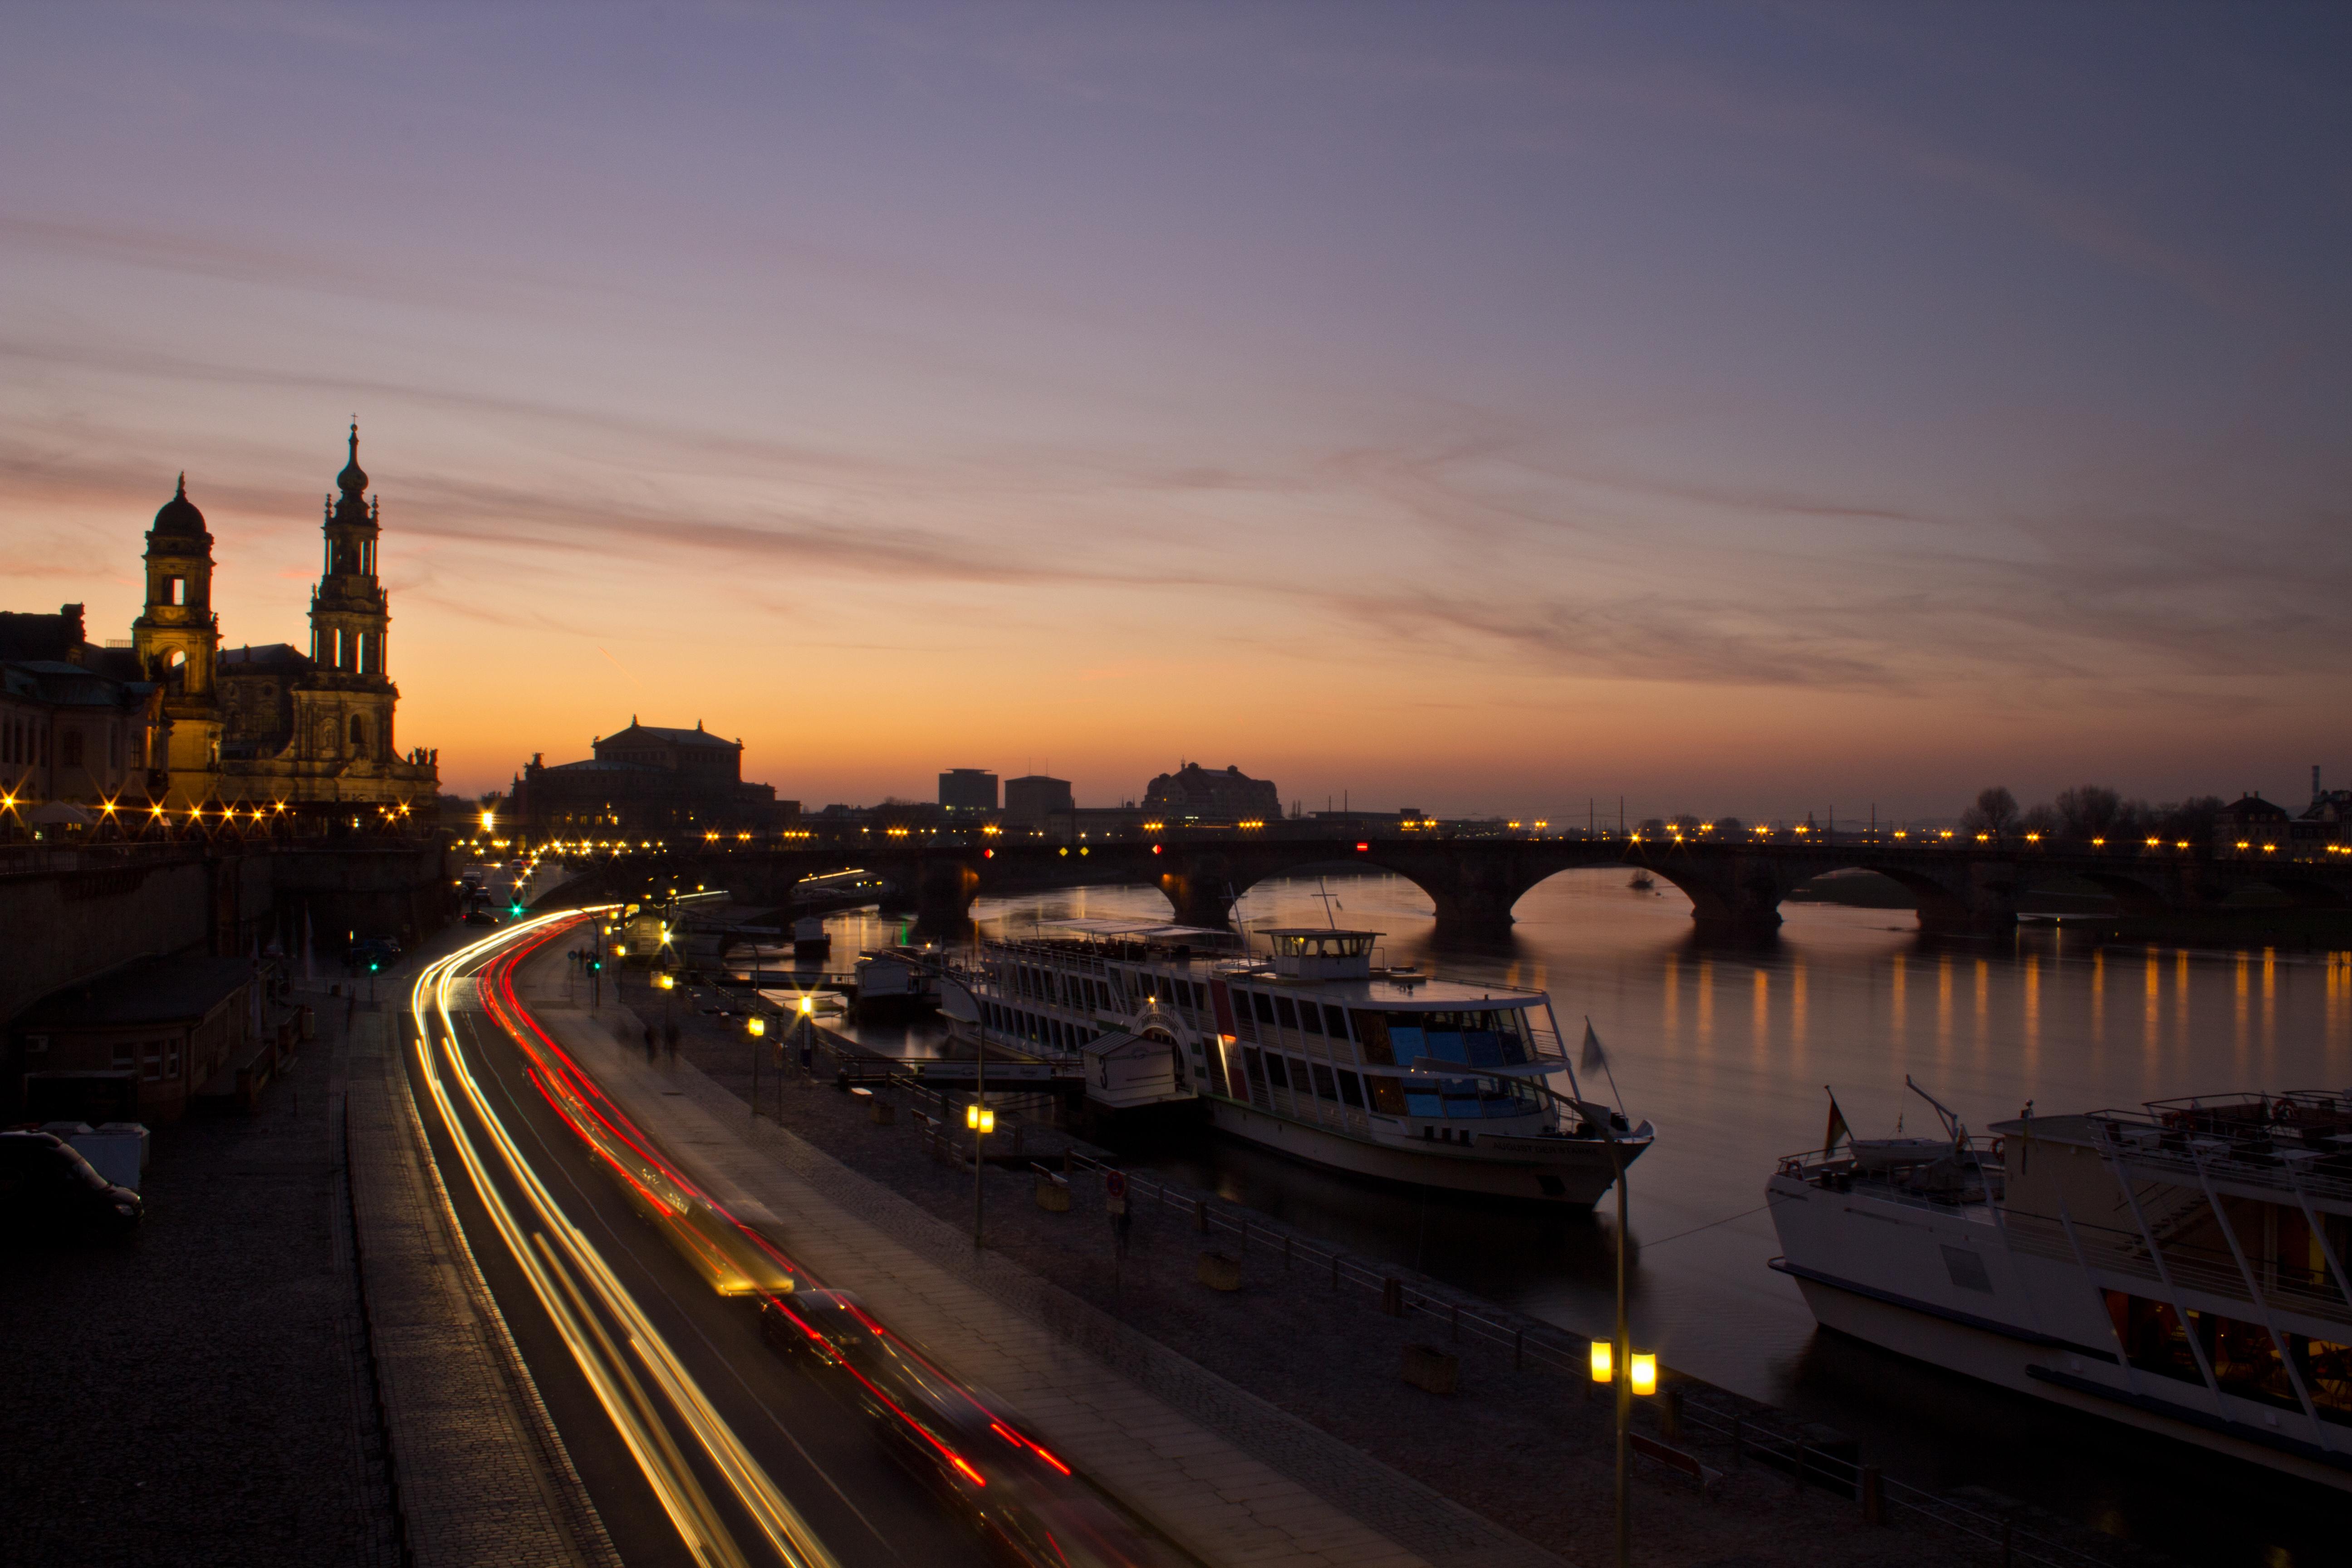 dresden_night_skyline by prox83